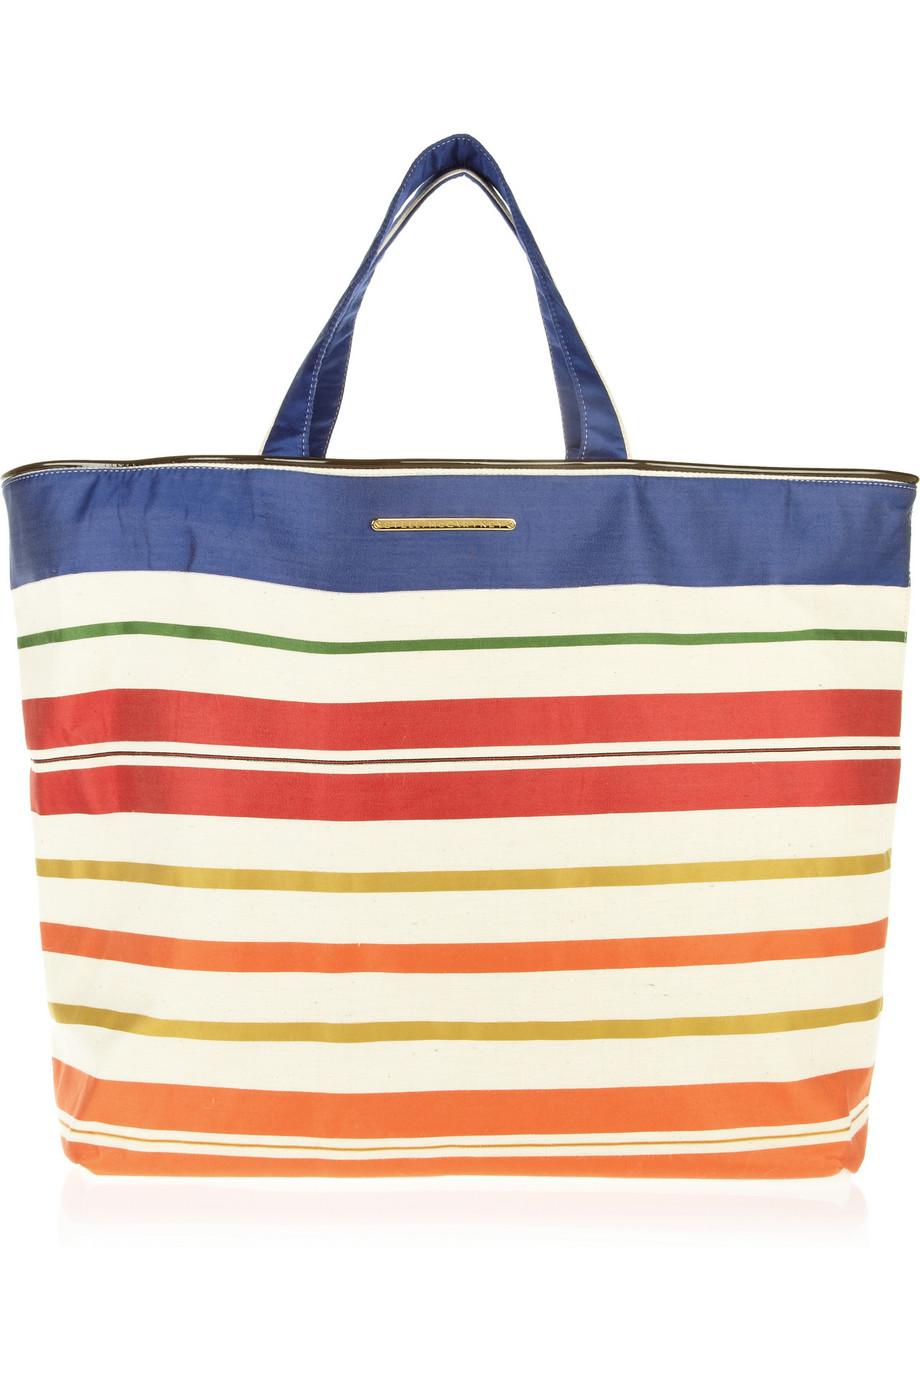 Stella mccartney Vanessa Striped Cotton Beach Bag in Blue | Lyst